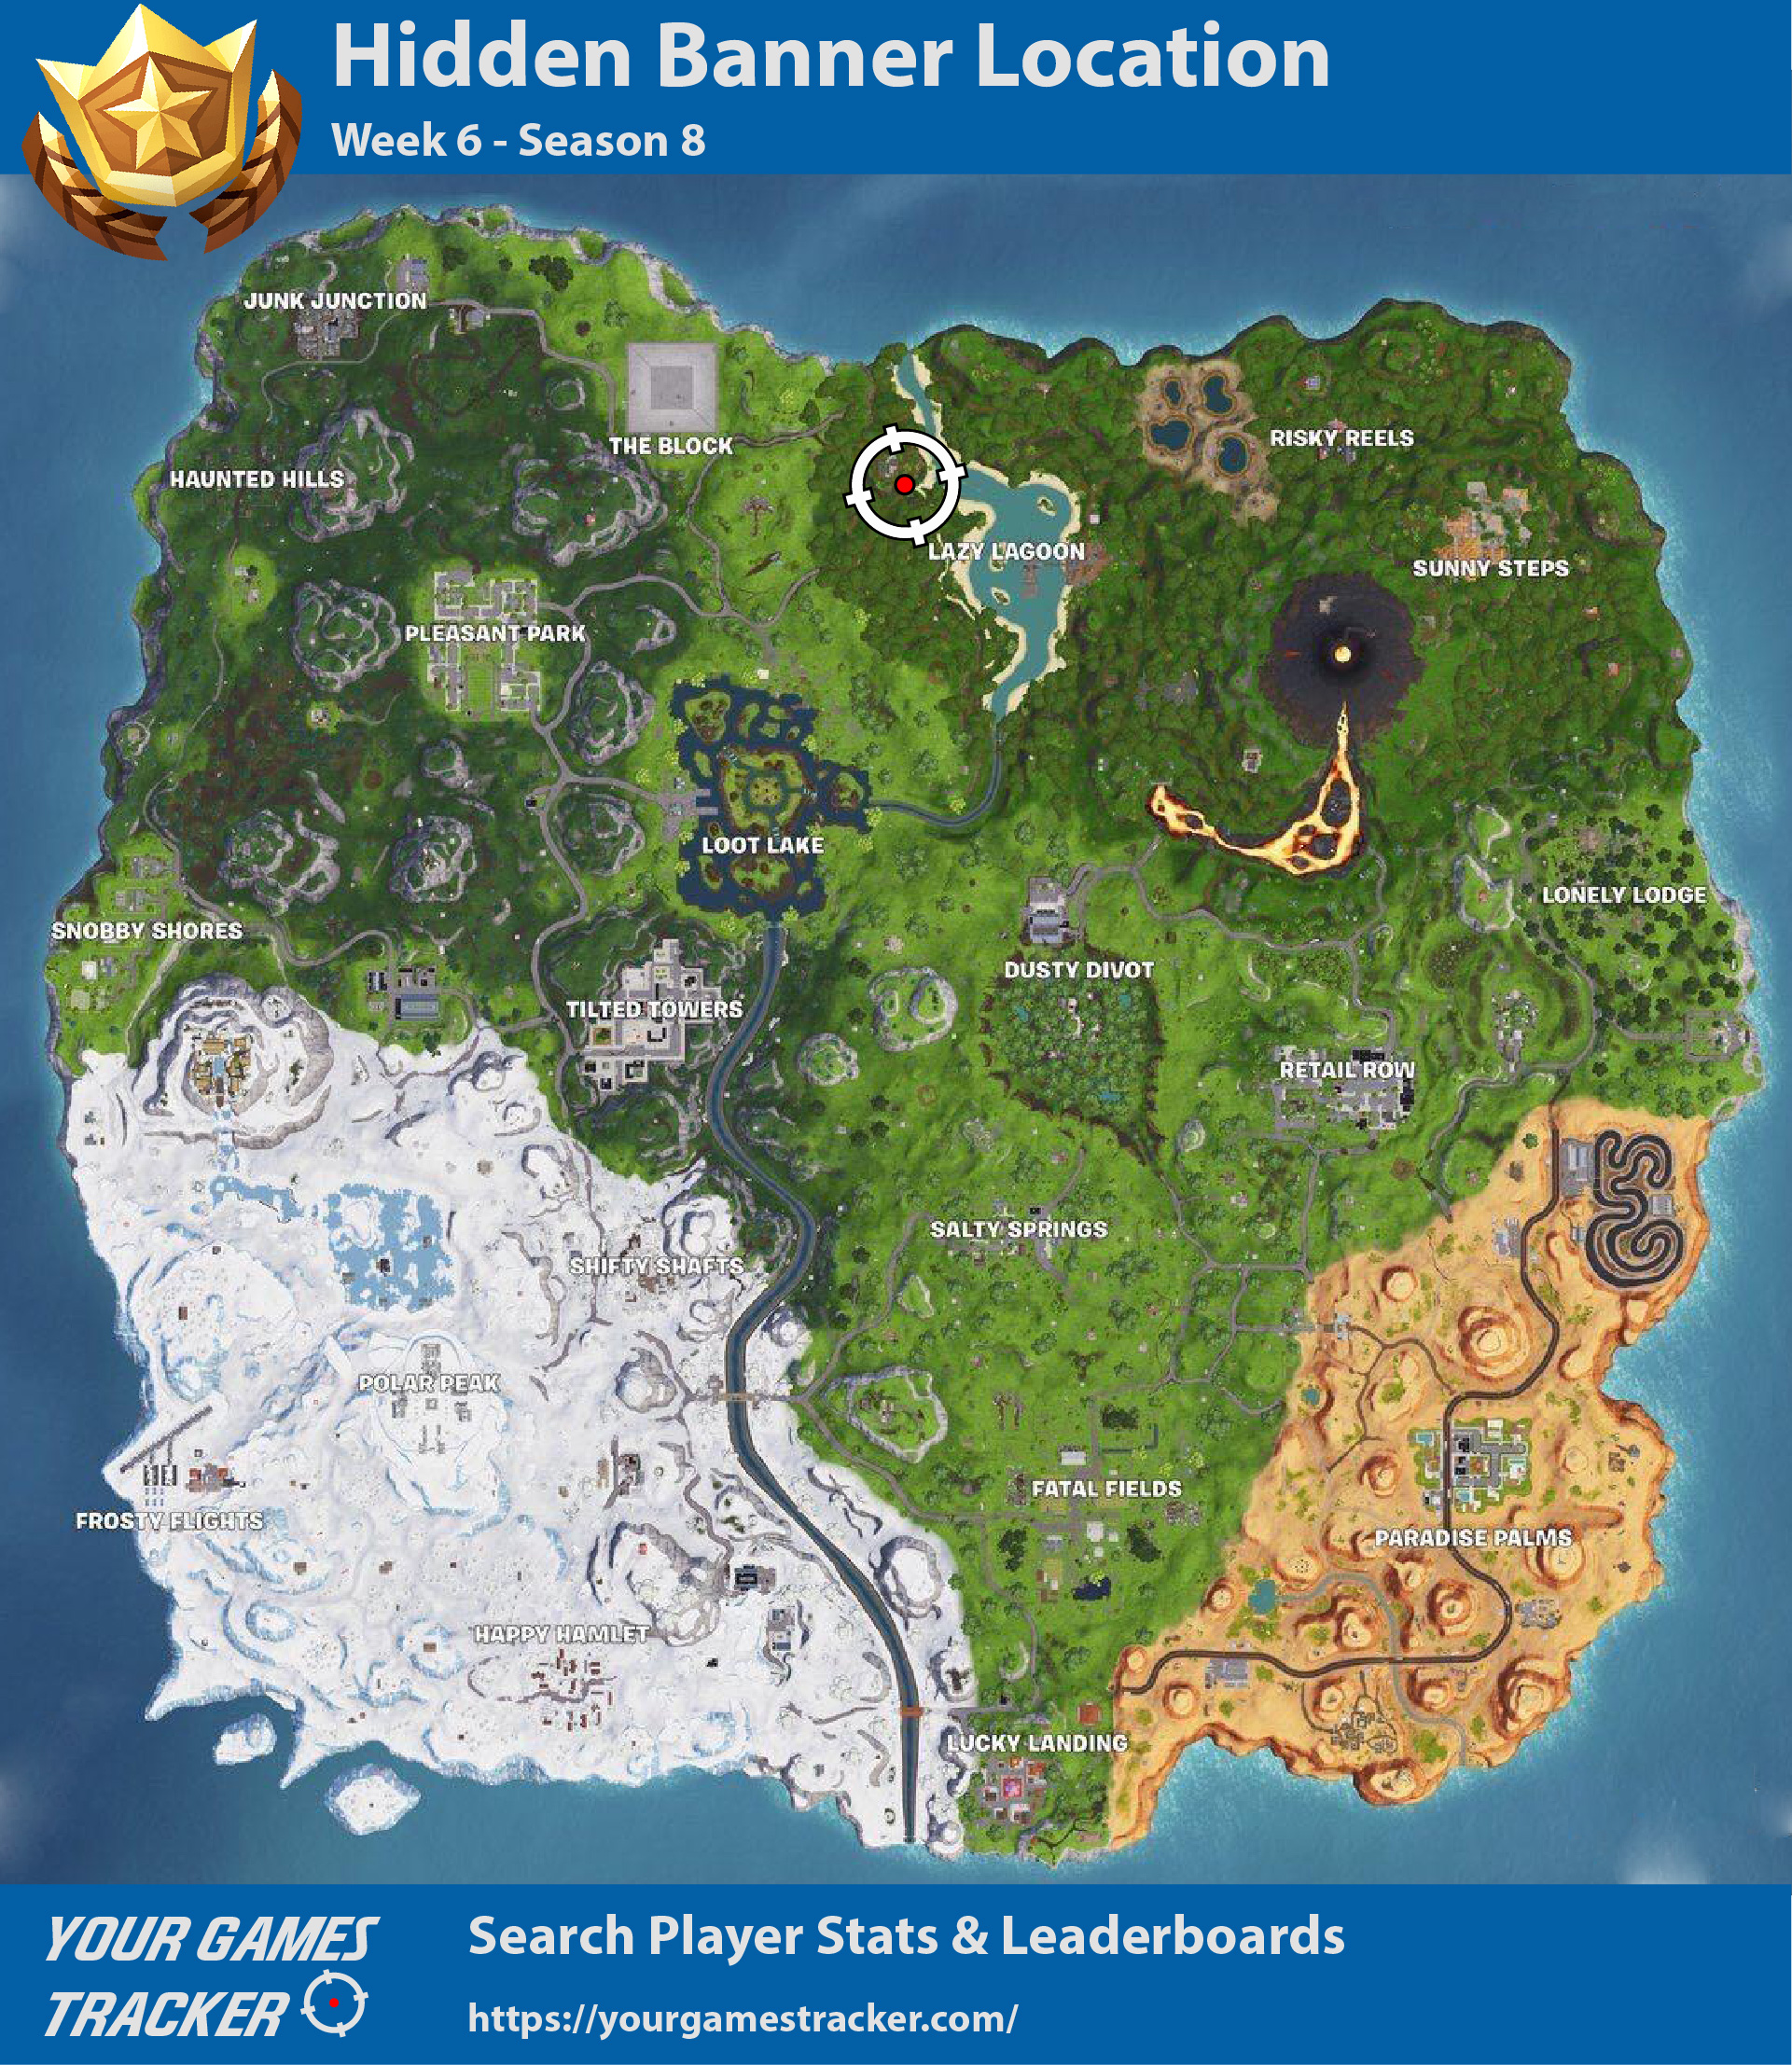 Hidden Banner Location Fortnite - Week 6 Season 8